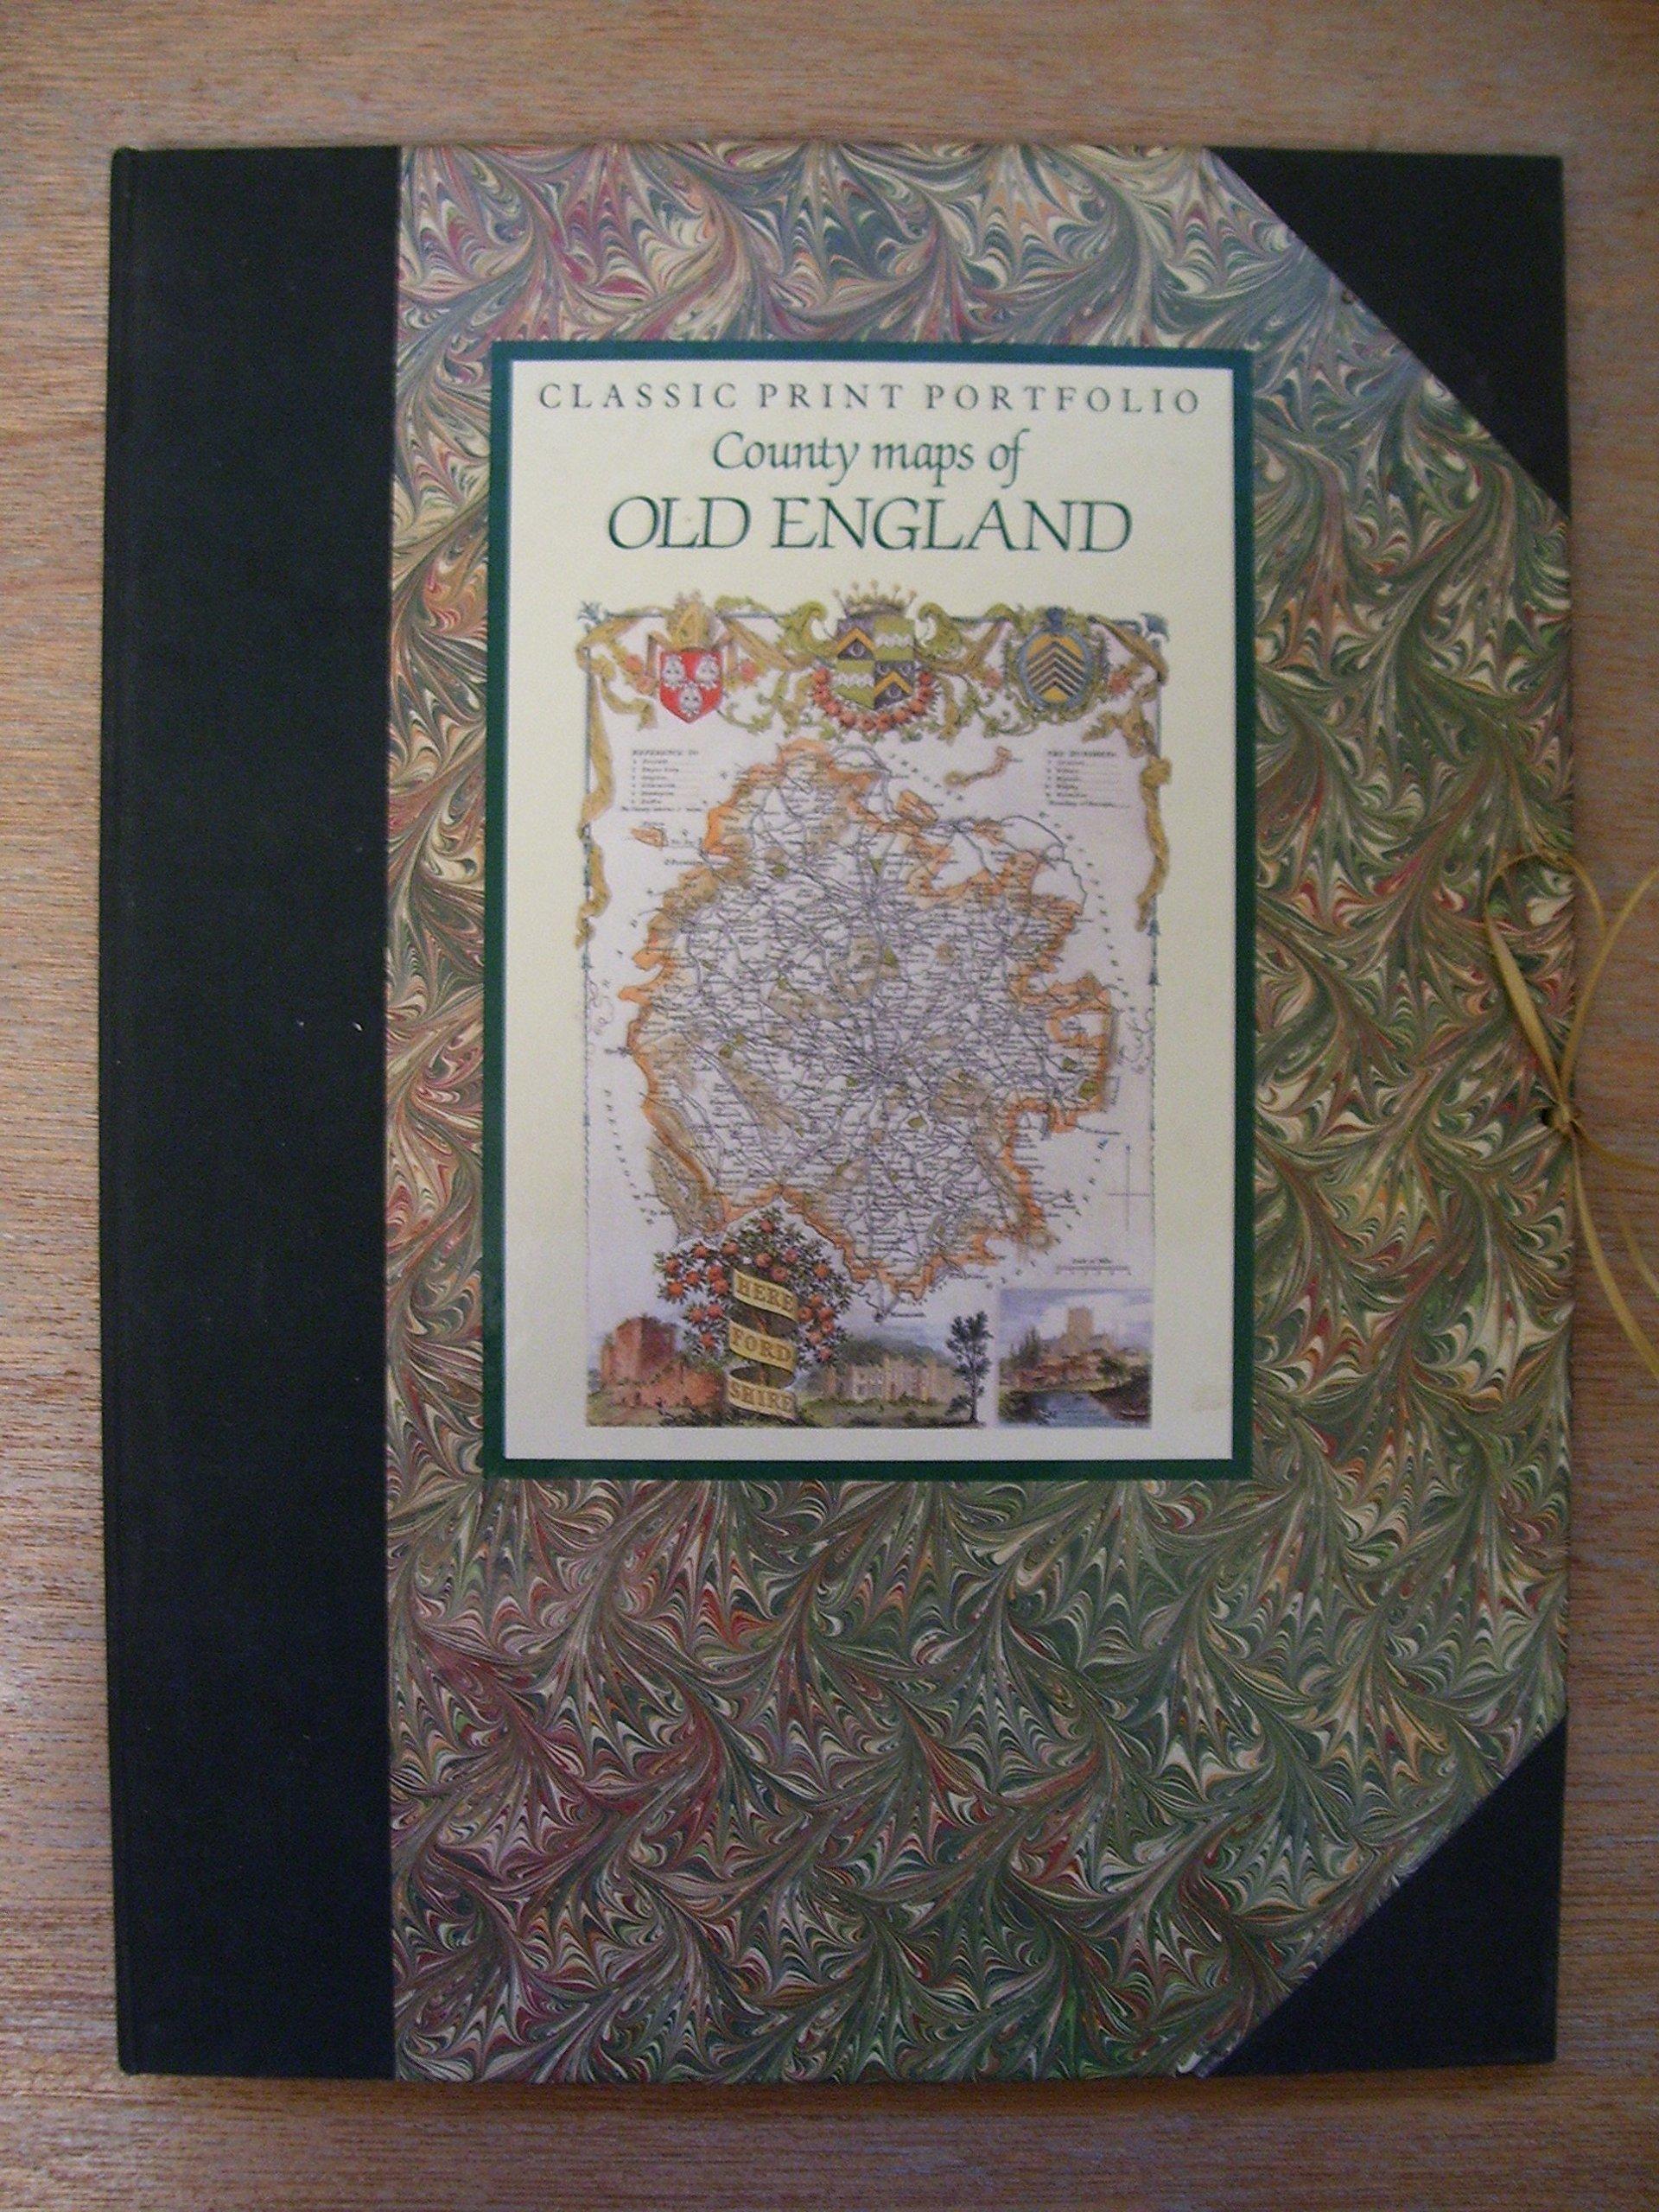 Classic Print Portfolio - County Maps of Old England: Amazon